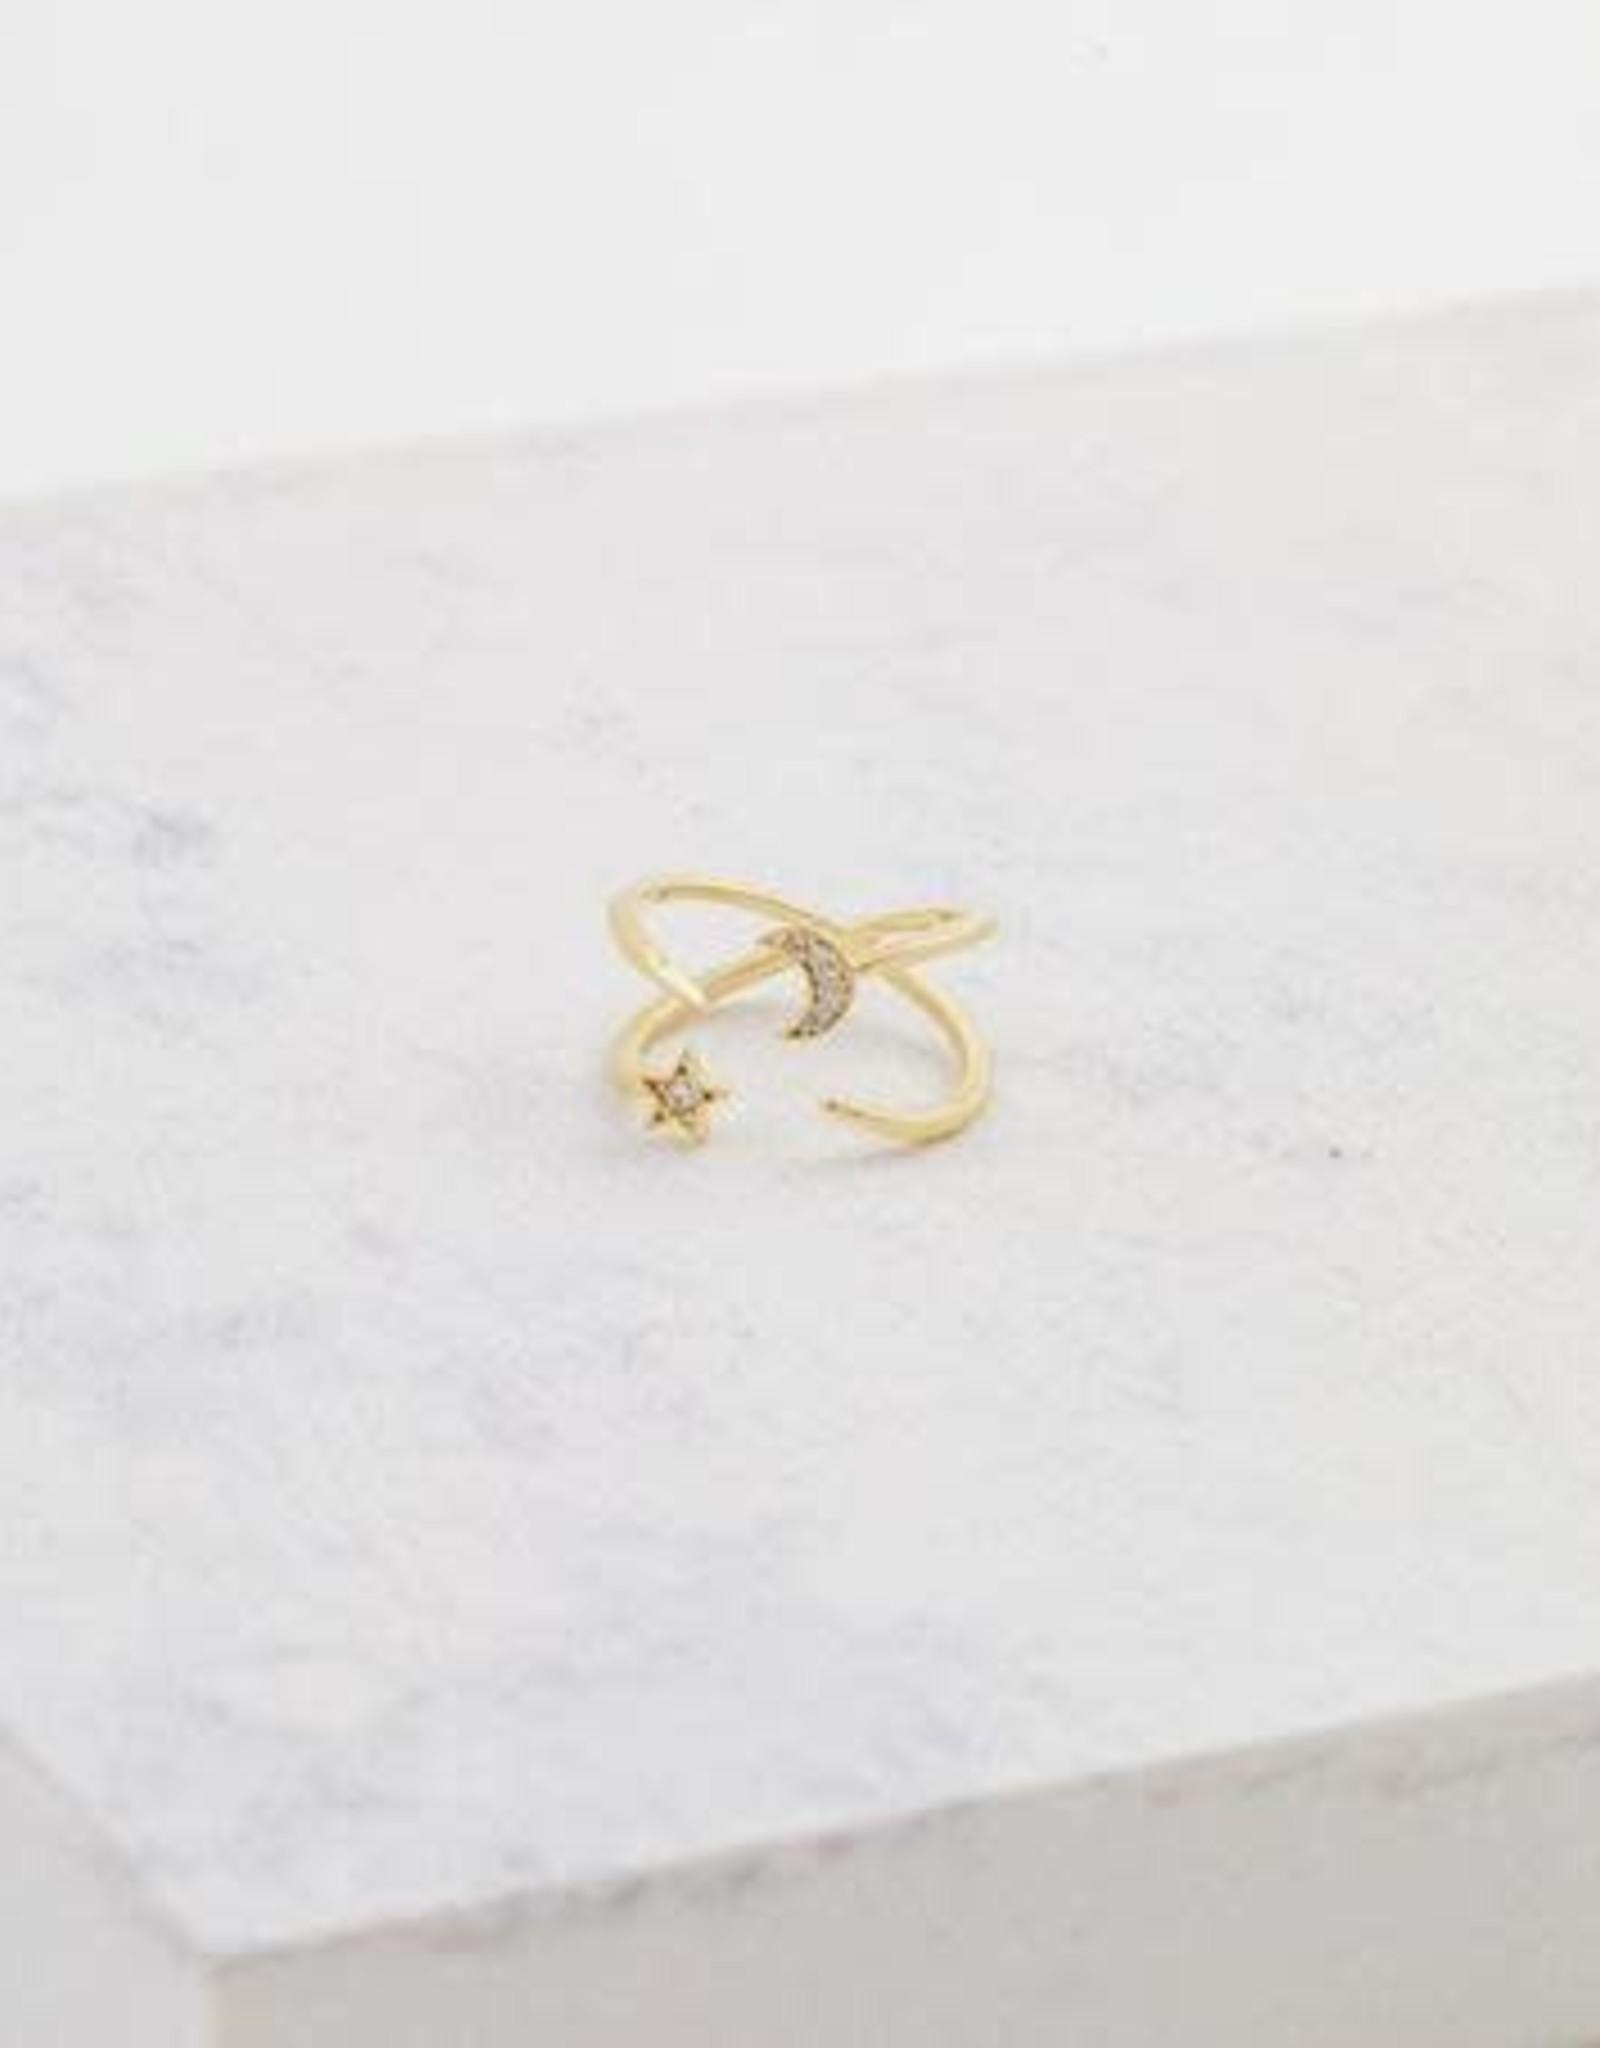 Ring, Galaxy Gold, Brass w/ Gold Plating